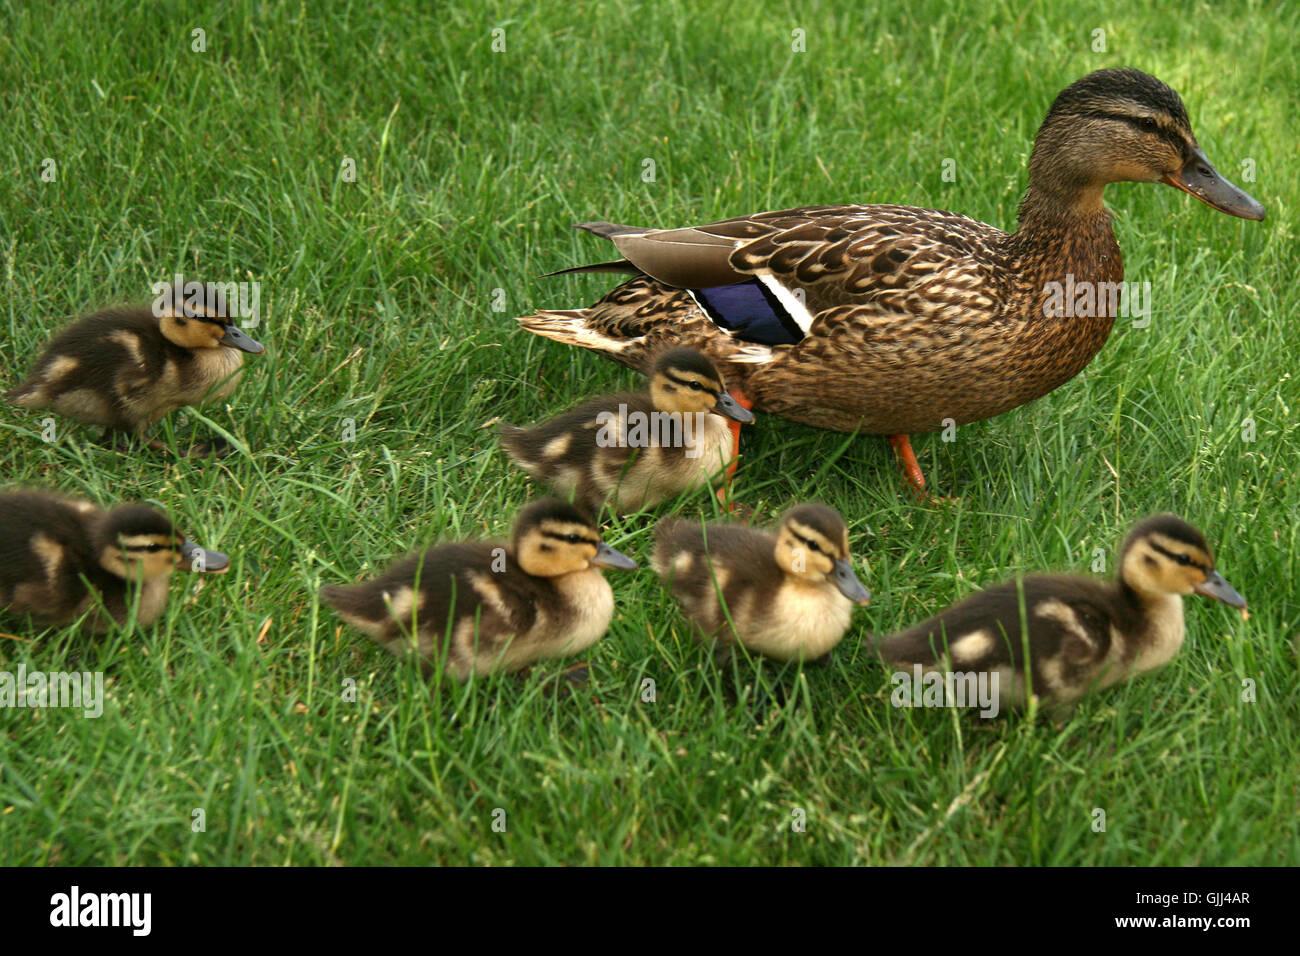 ducks alone-educating familiy - Stock Image